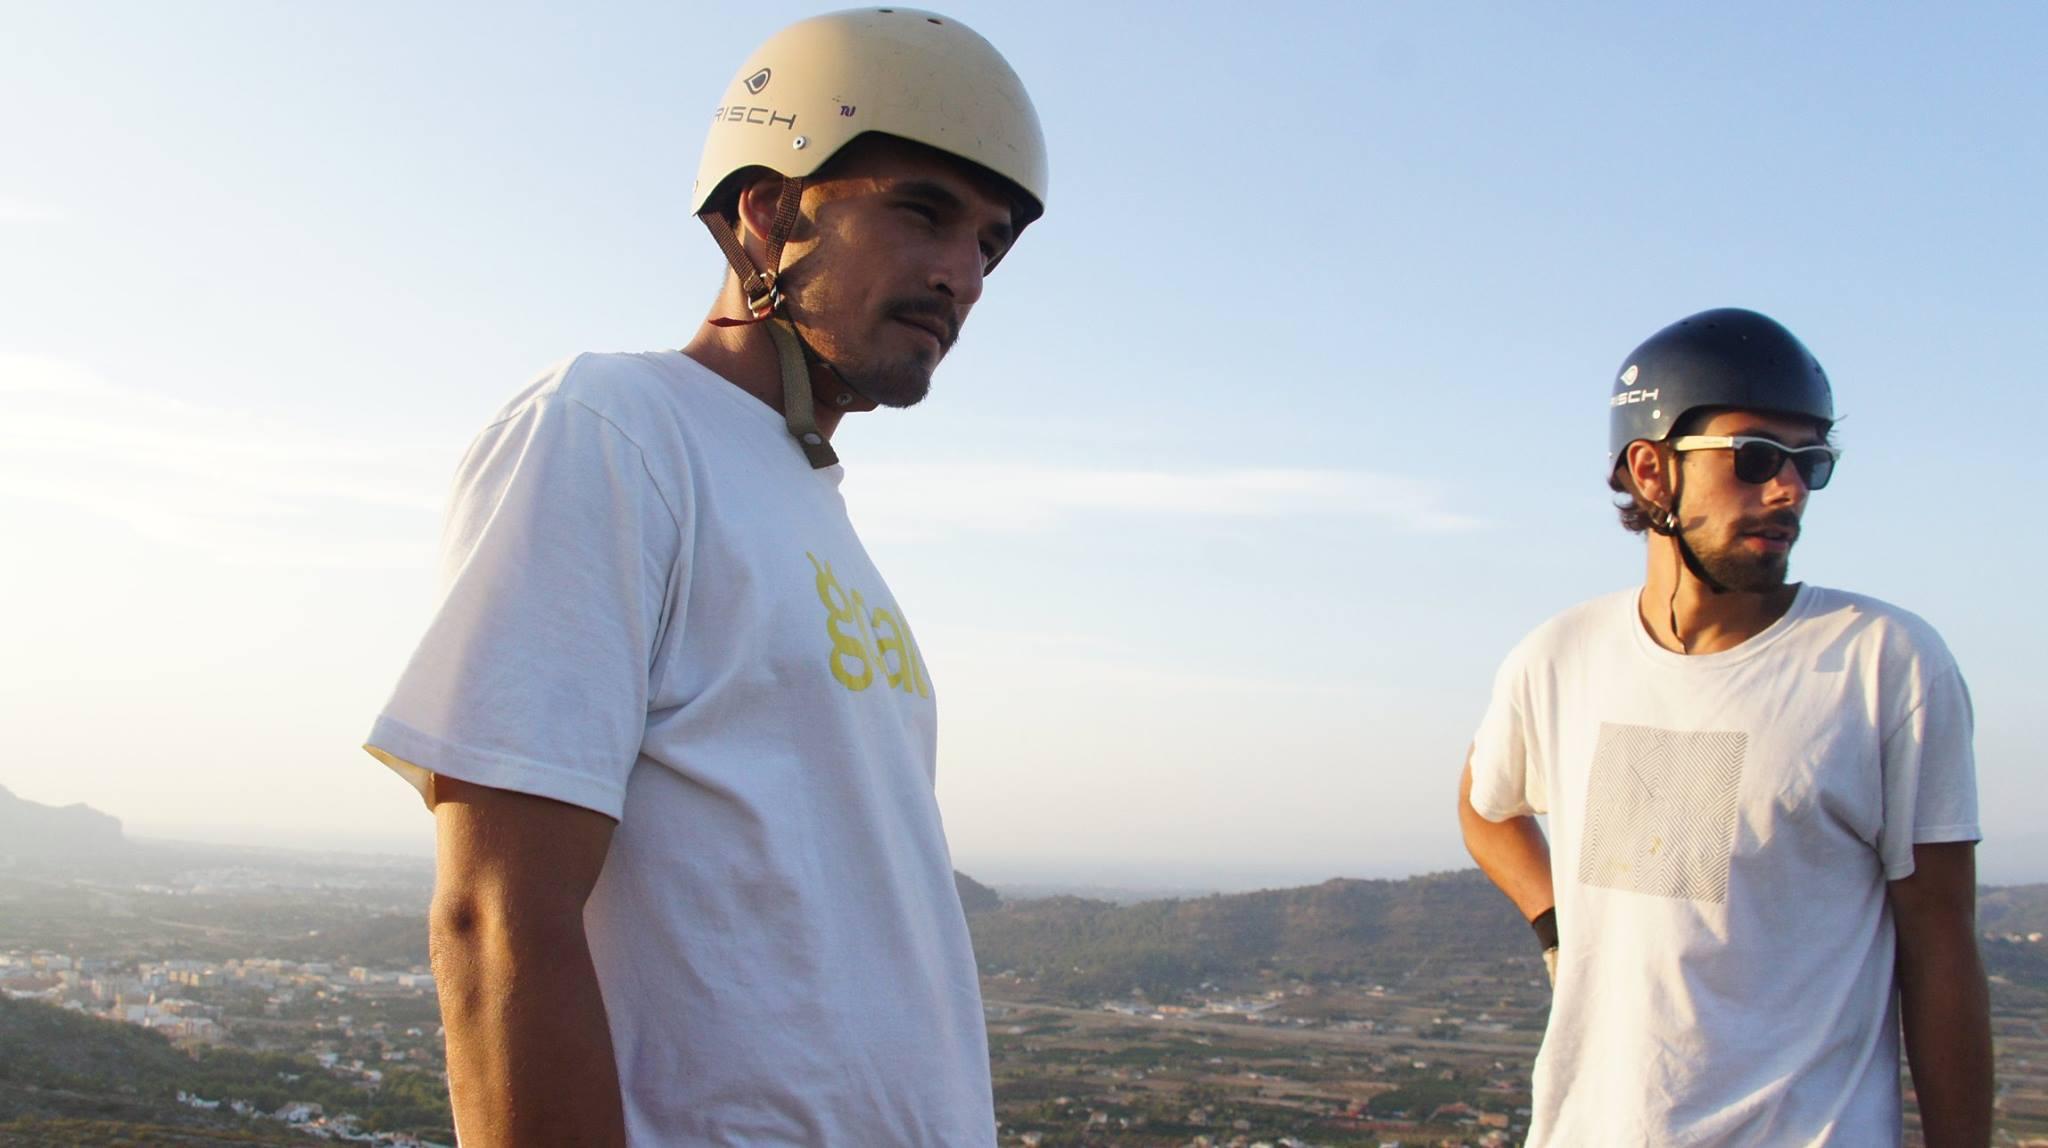 alex and pablo 2